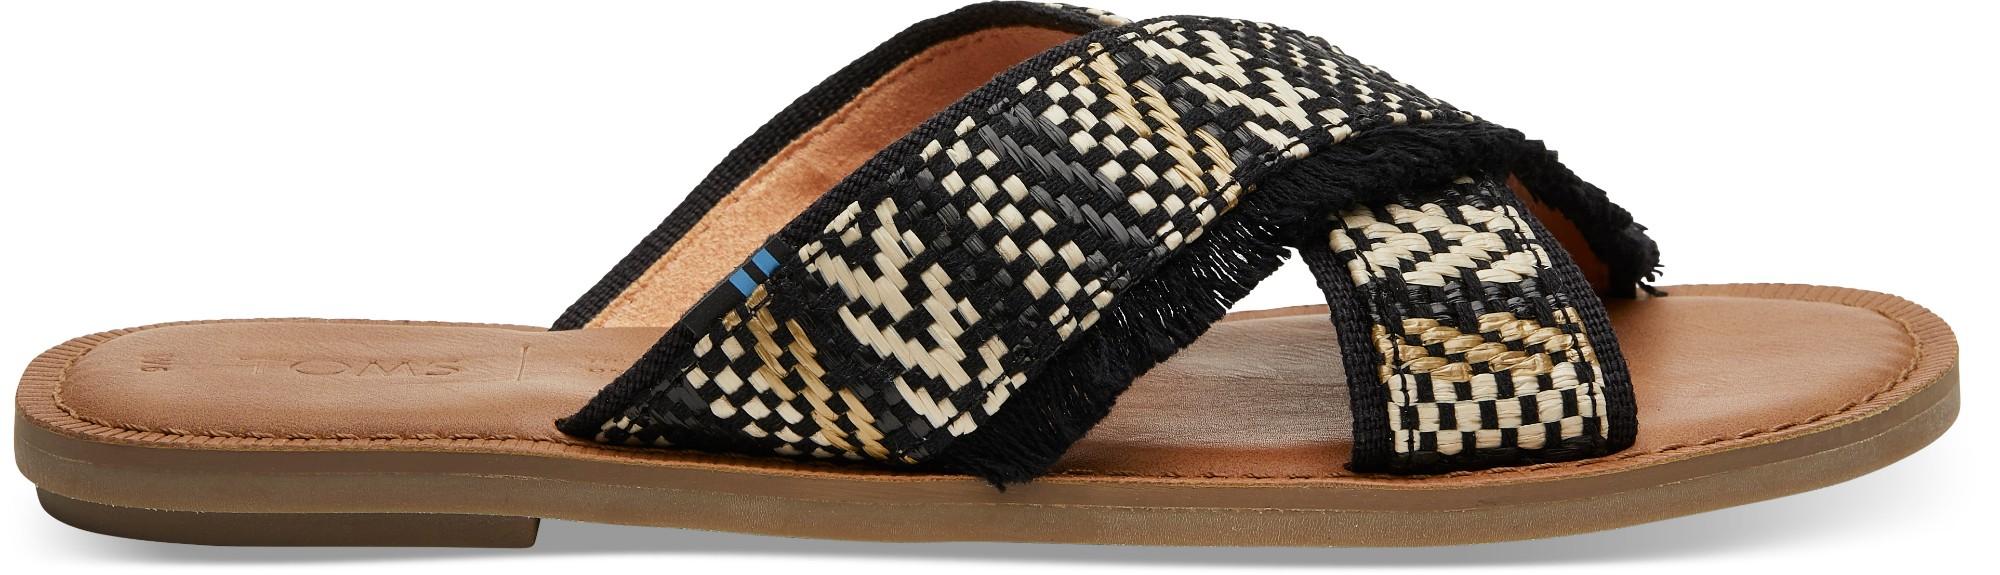 TOMS Geometric Woven Women's Viv Sandal Black 38